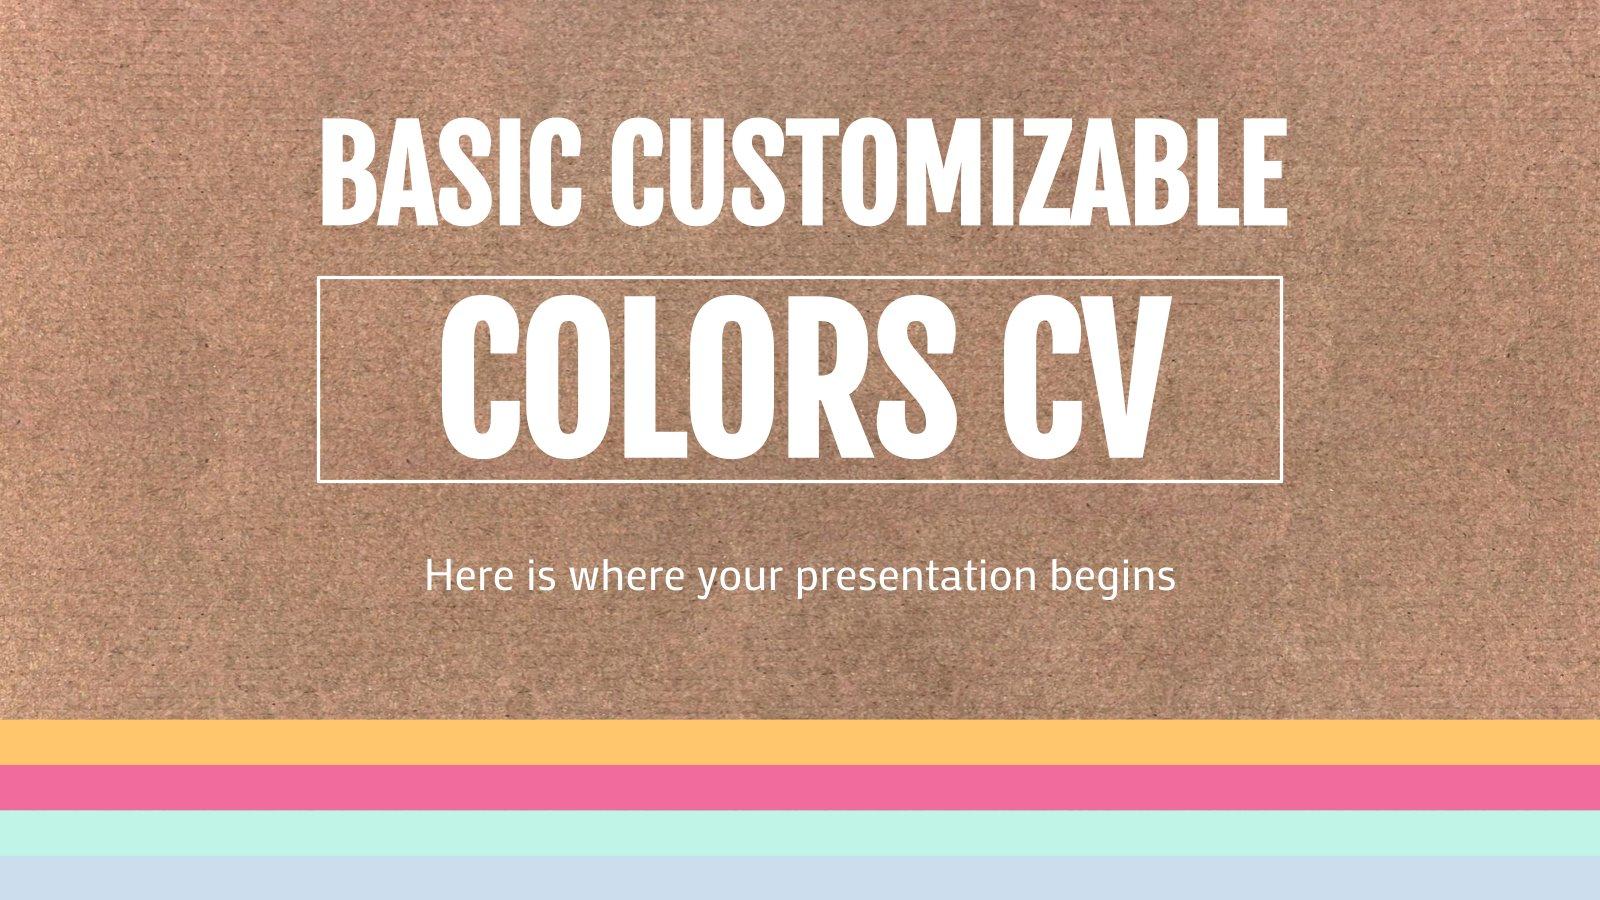 Basic Customizable Colors CV presentation template